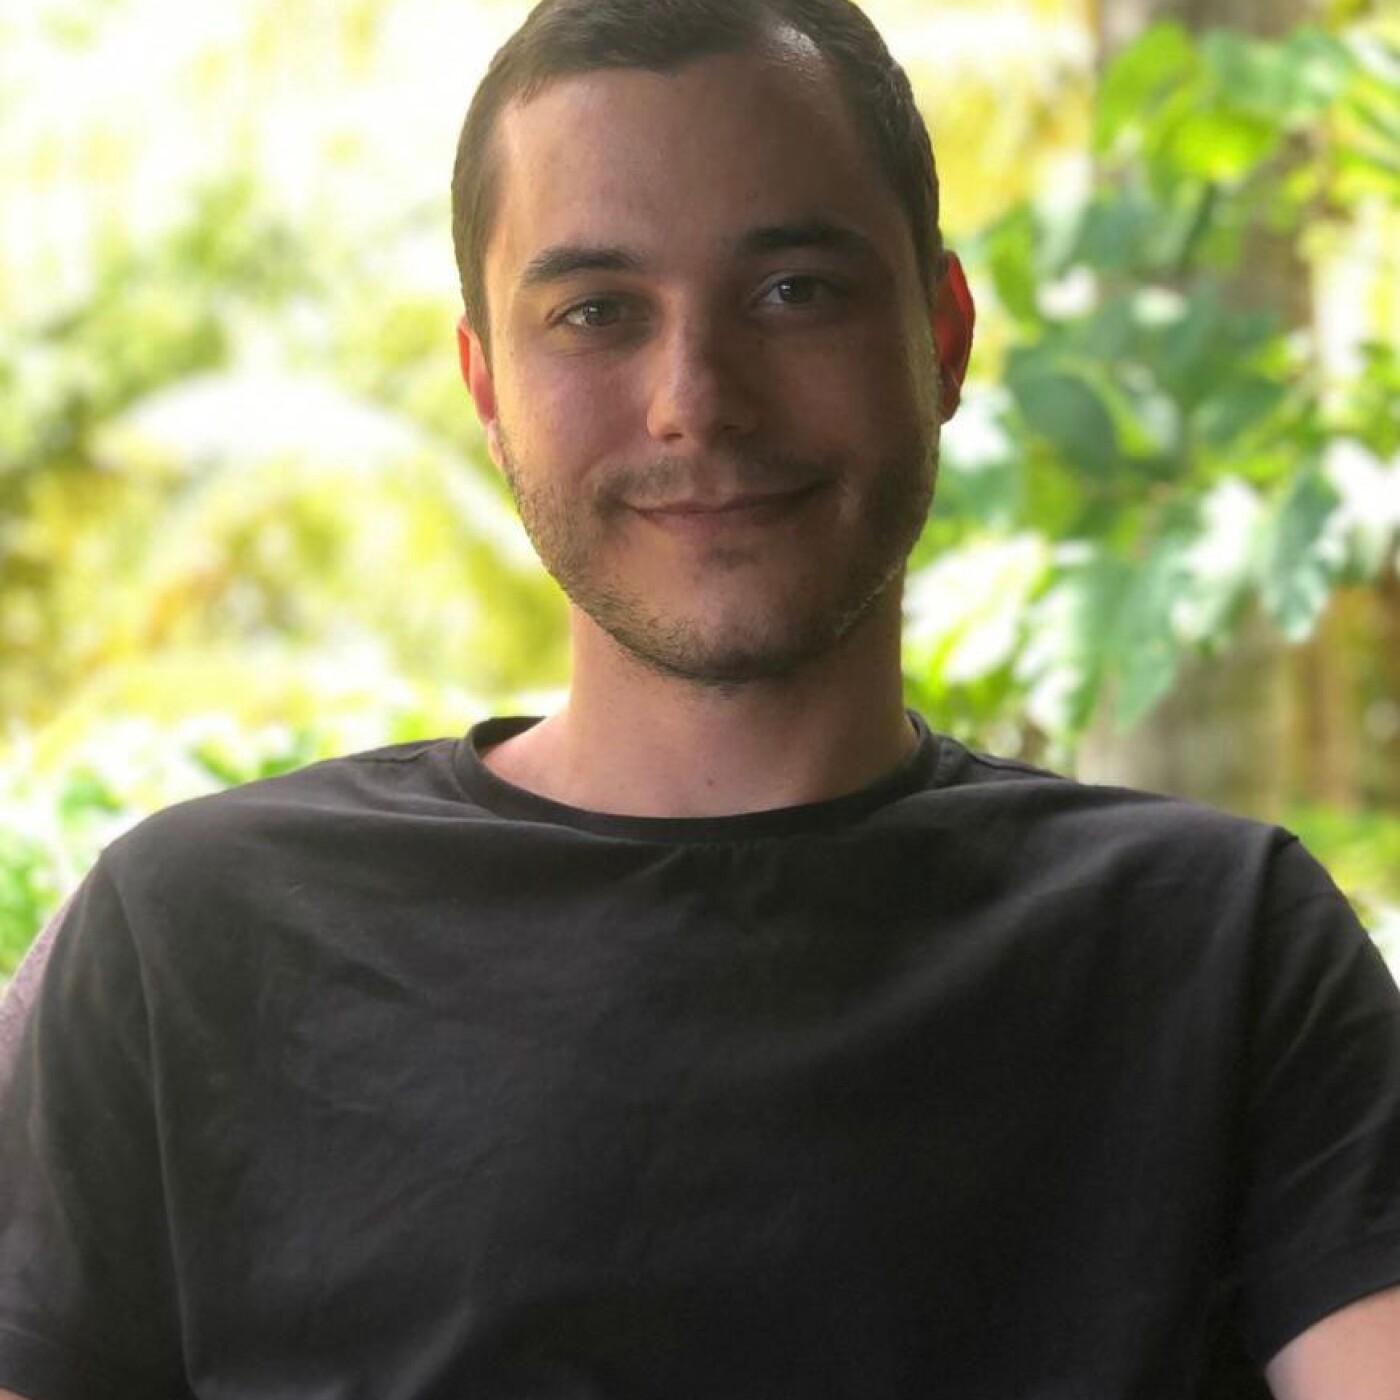 Martin, le fondateur, présente GlobeDreamers - 01 10 2021 - StereoChic Radio